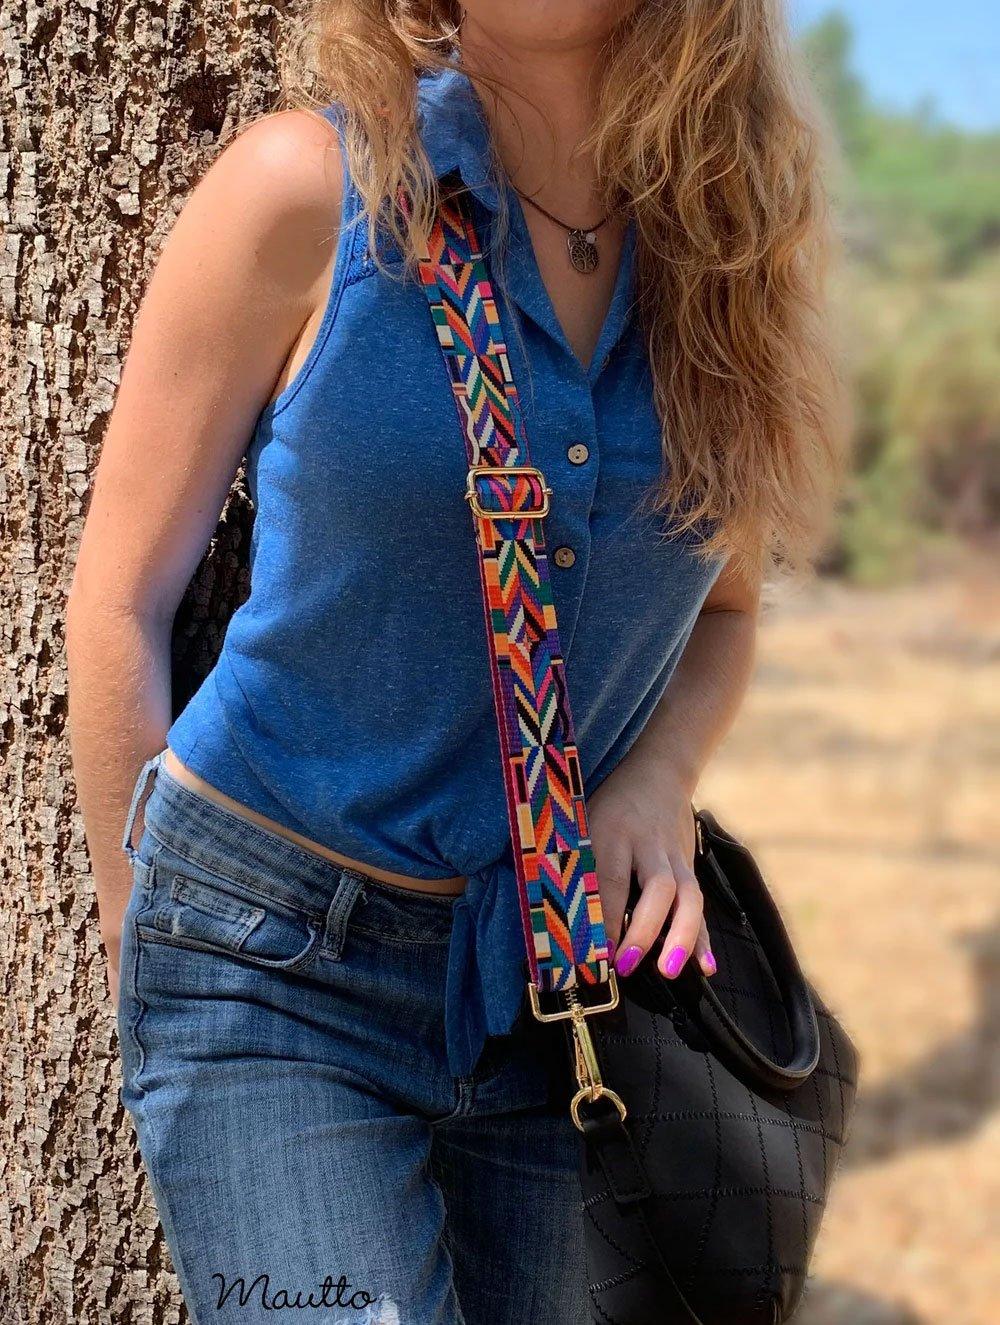 Image of Colorful Geometric Strap for Handbags - Tribal Native Couture Design - Adjustable Shoulder-Crossbody